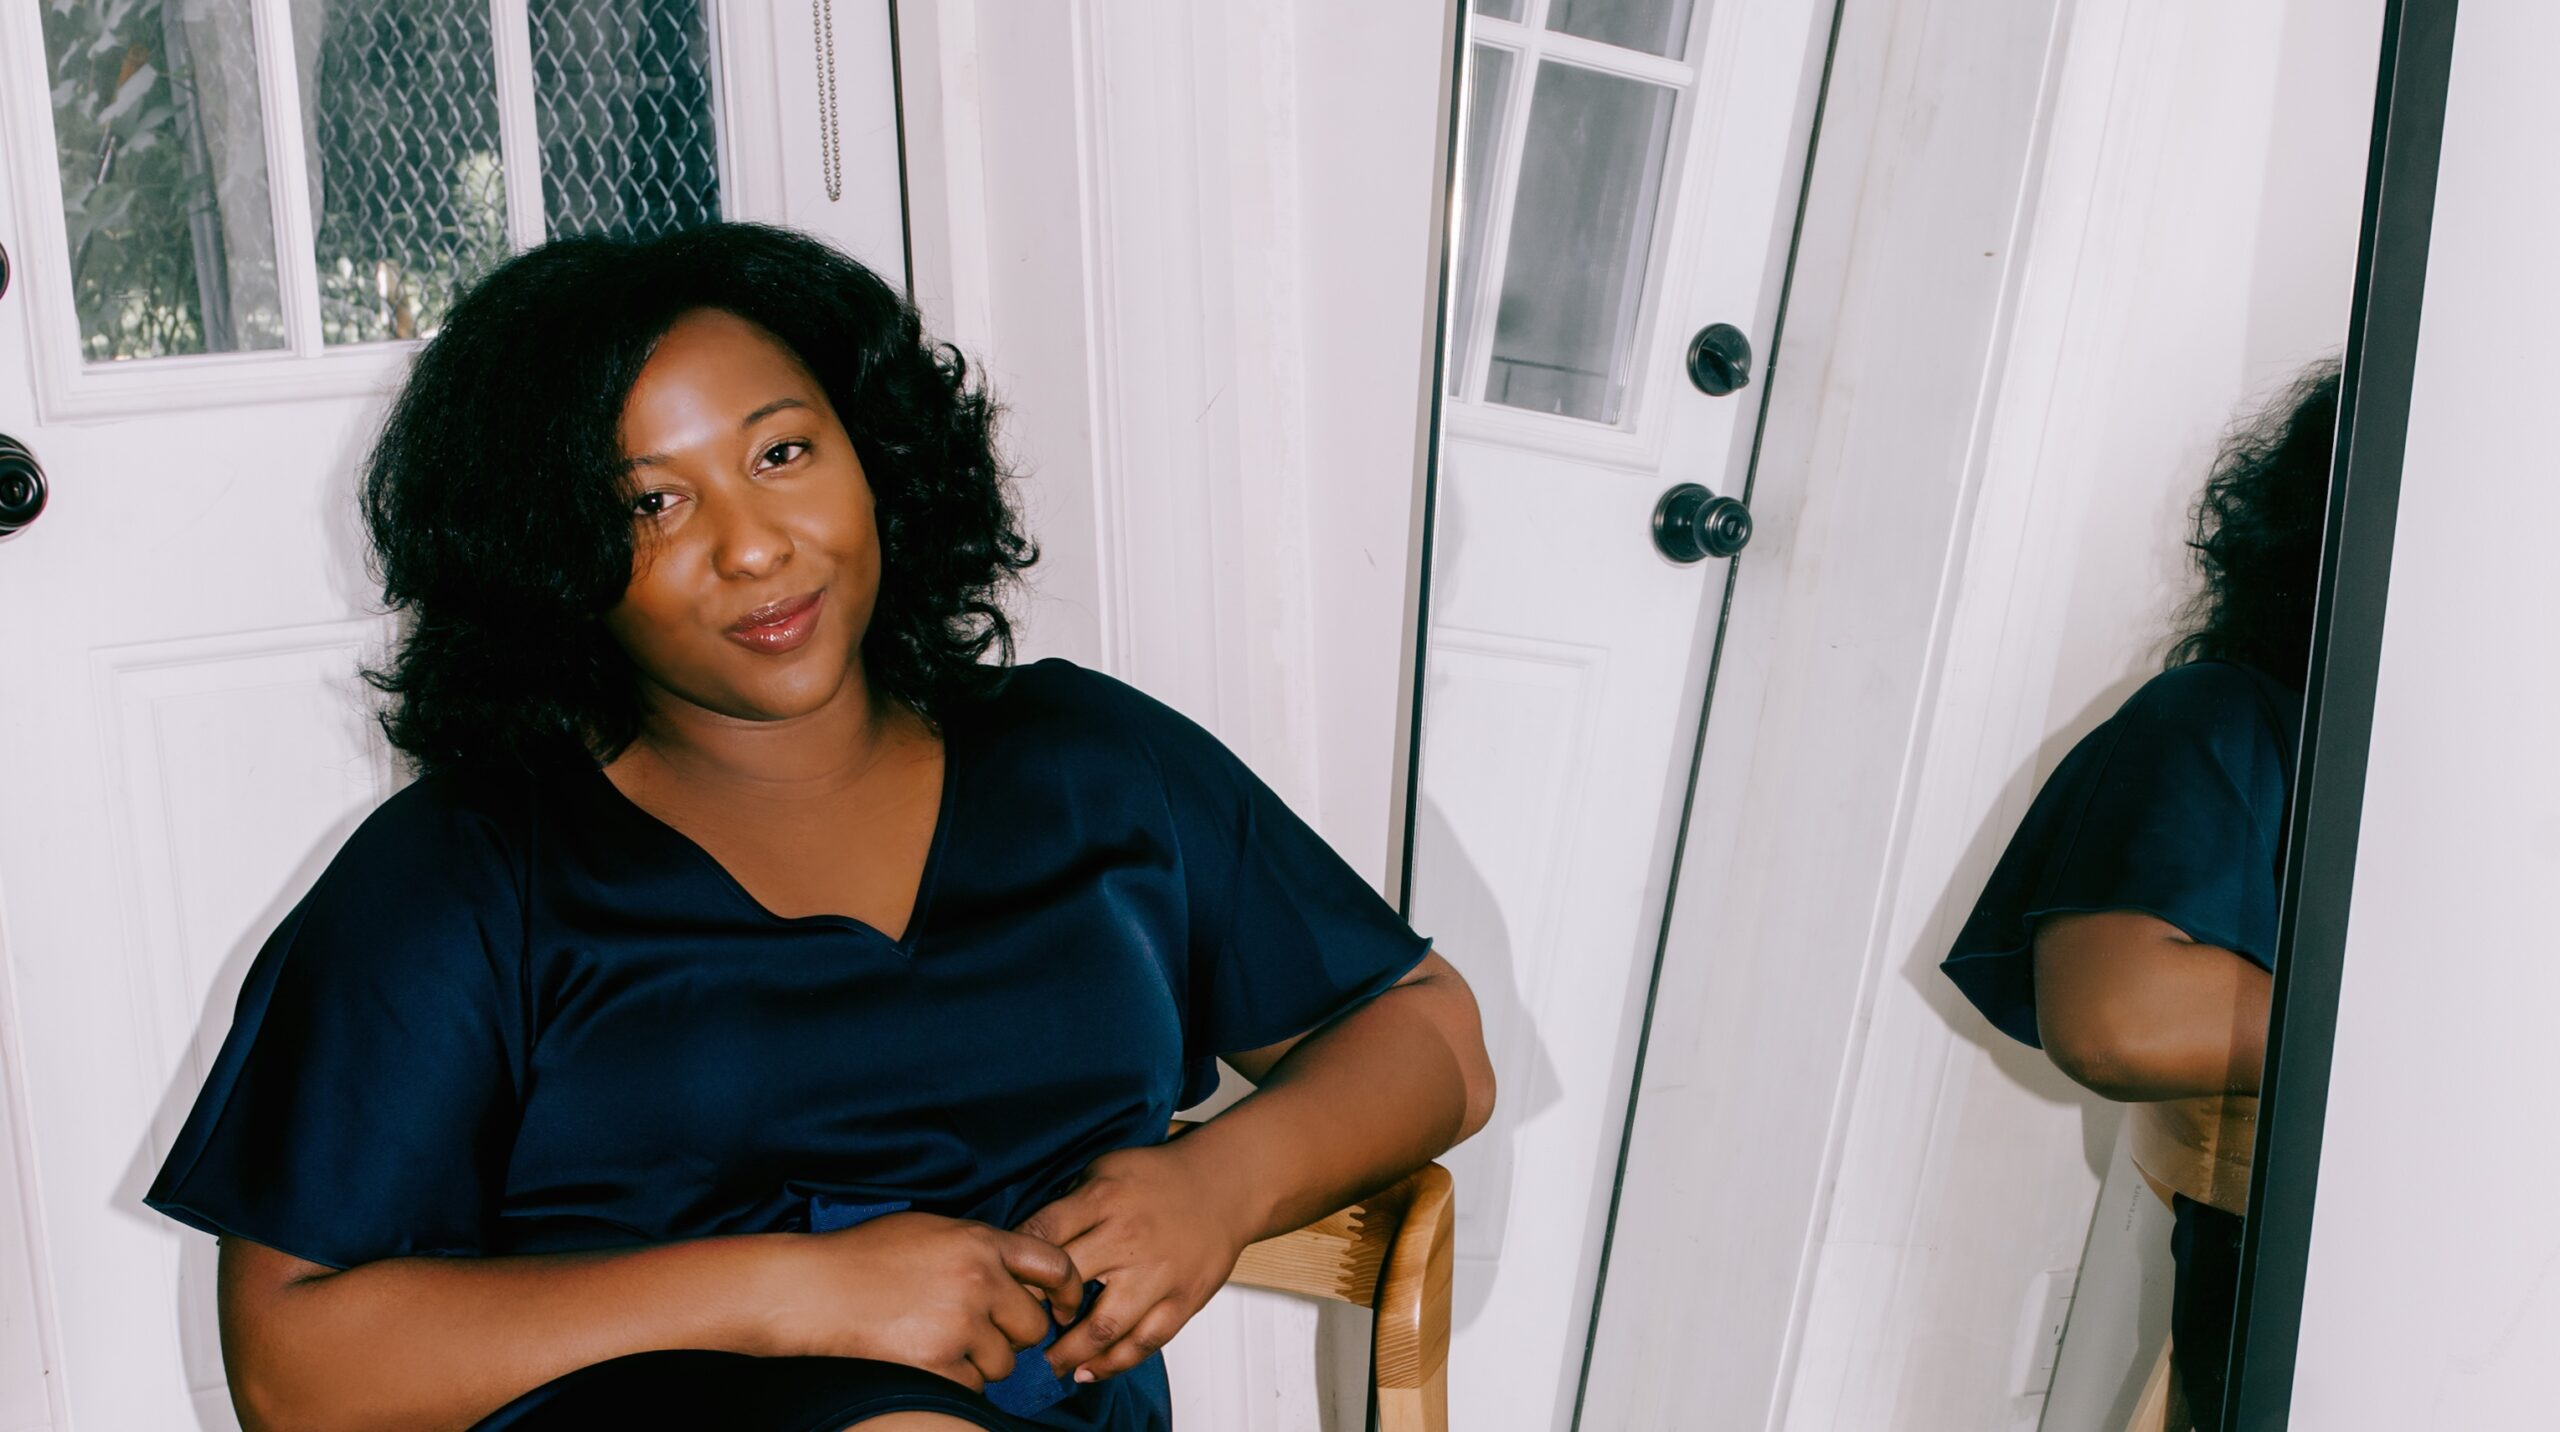 Beautyocracy founder Auja Little